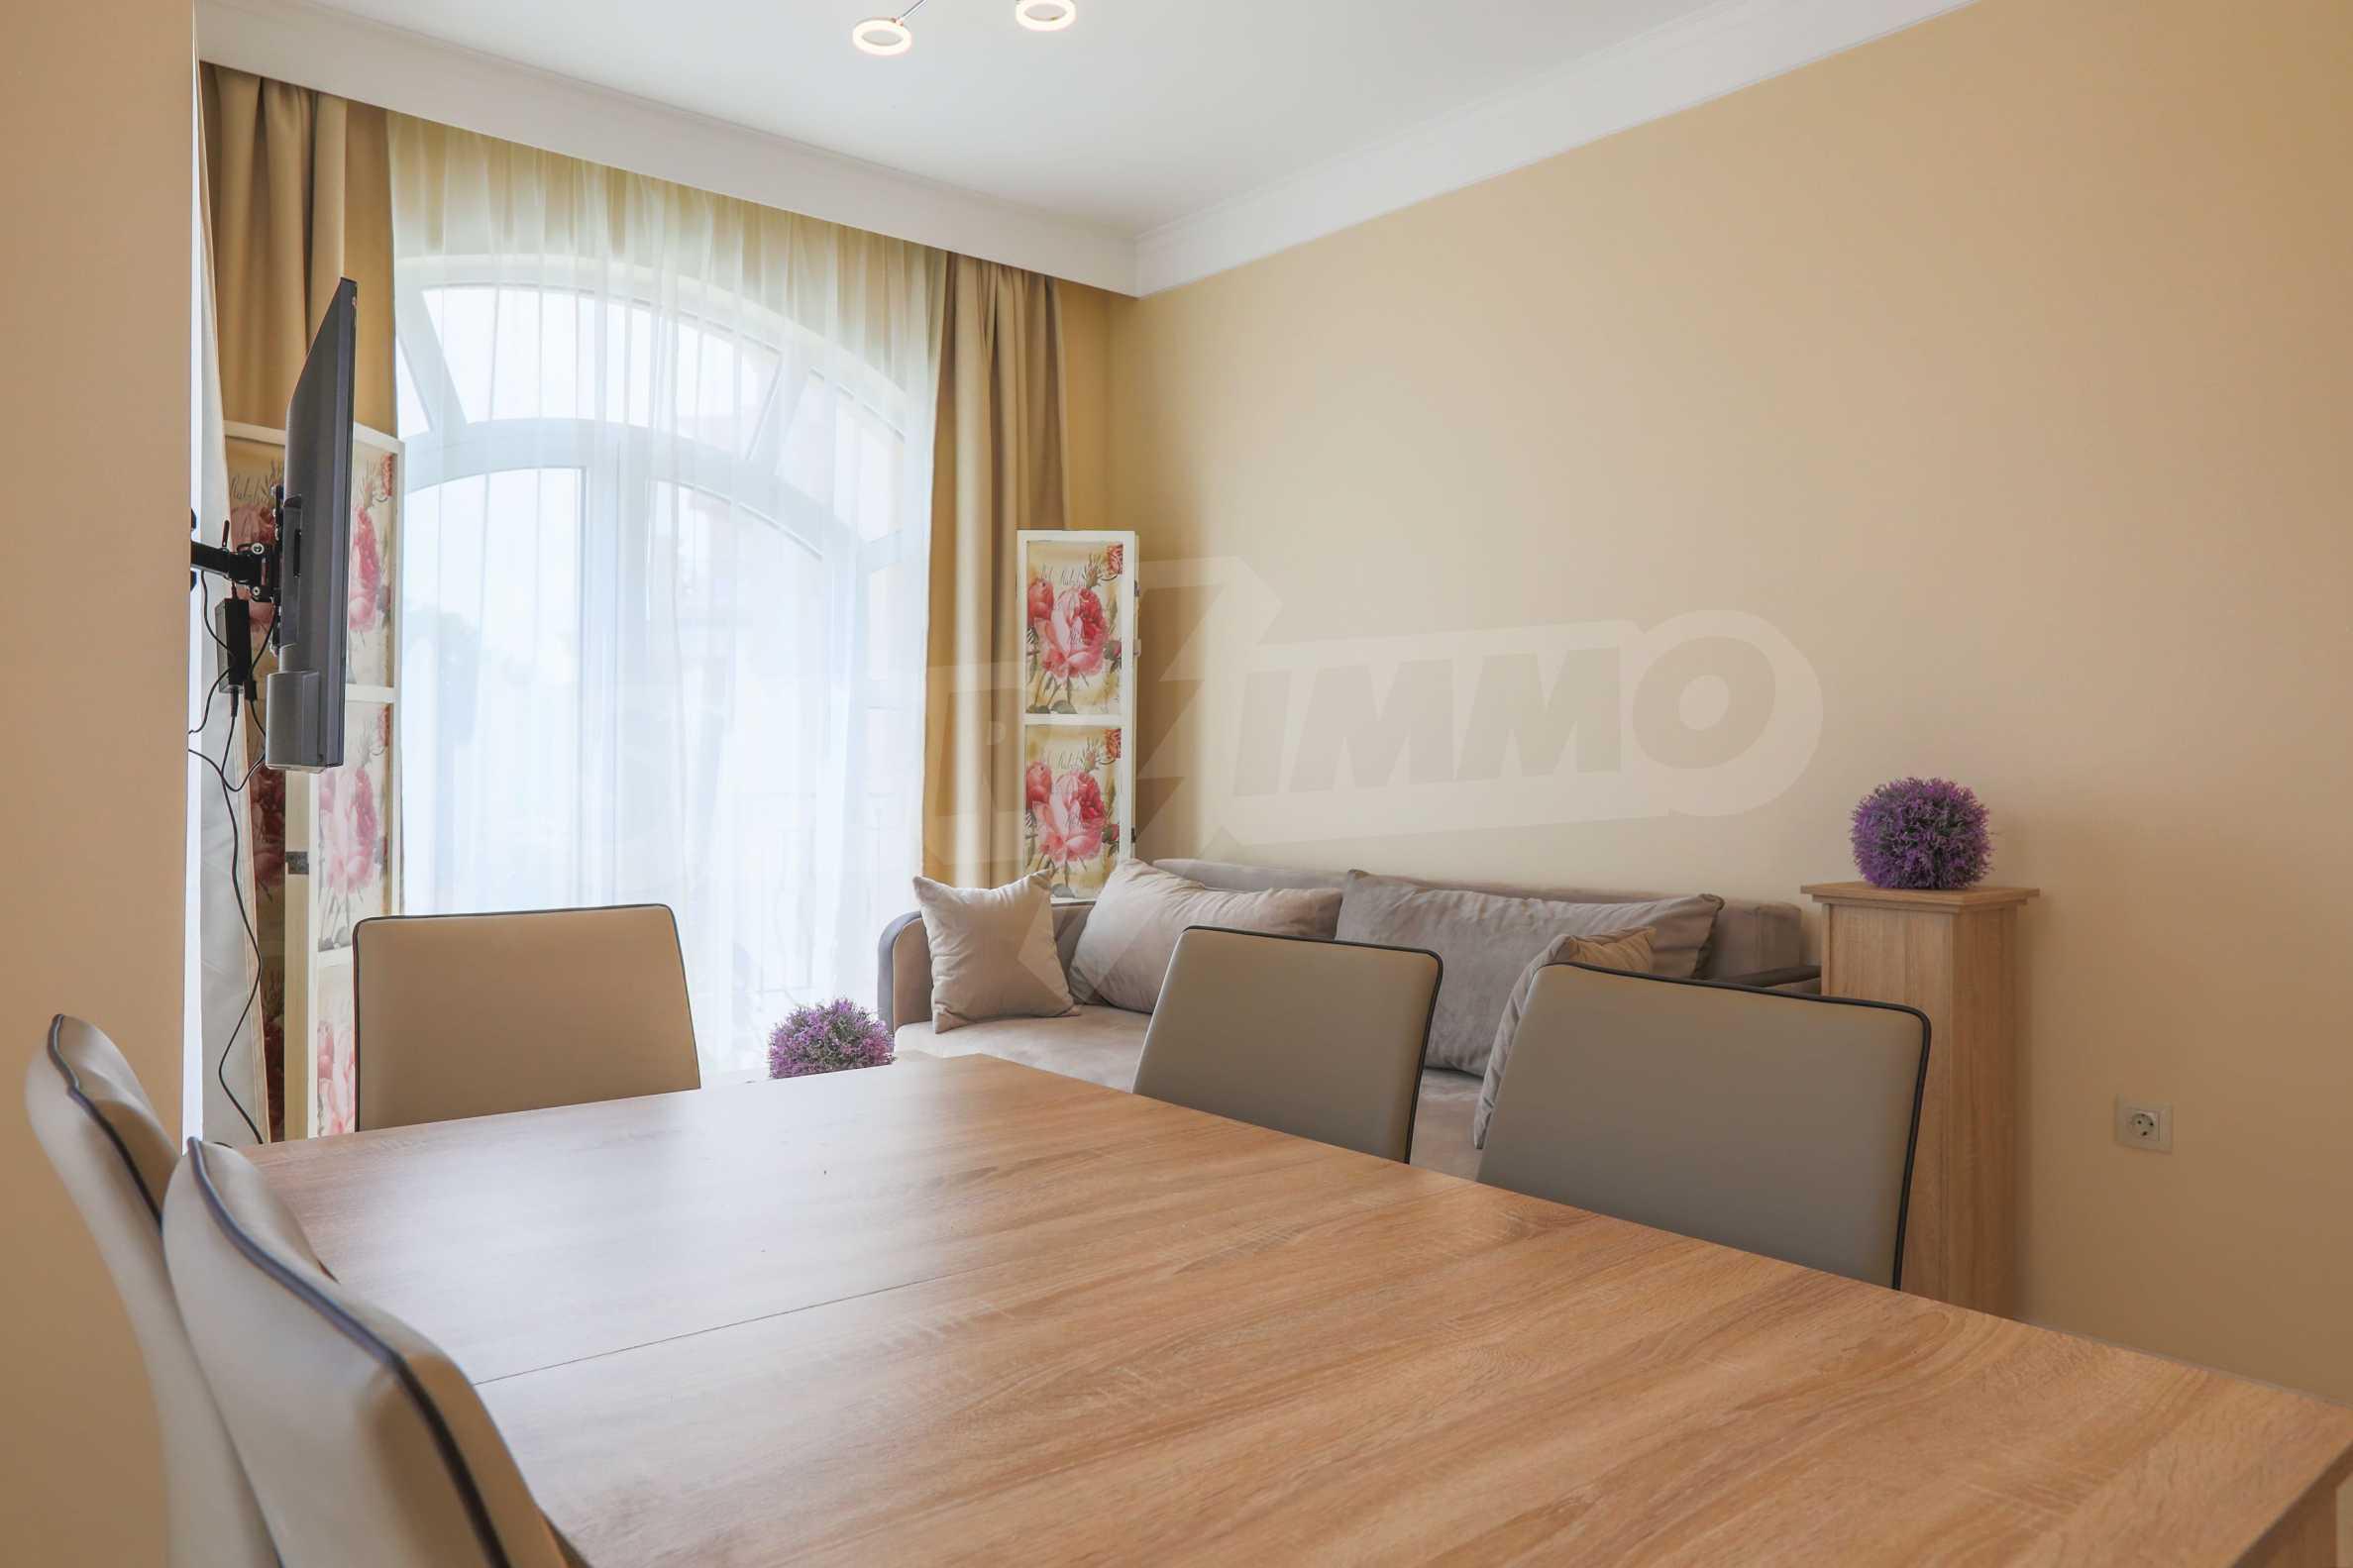 Комфортен двустаен апартамент под наем в Belle Époque Beach Residence, курорт Лозенец 5